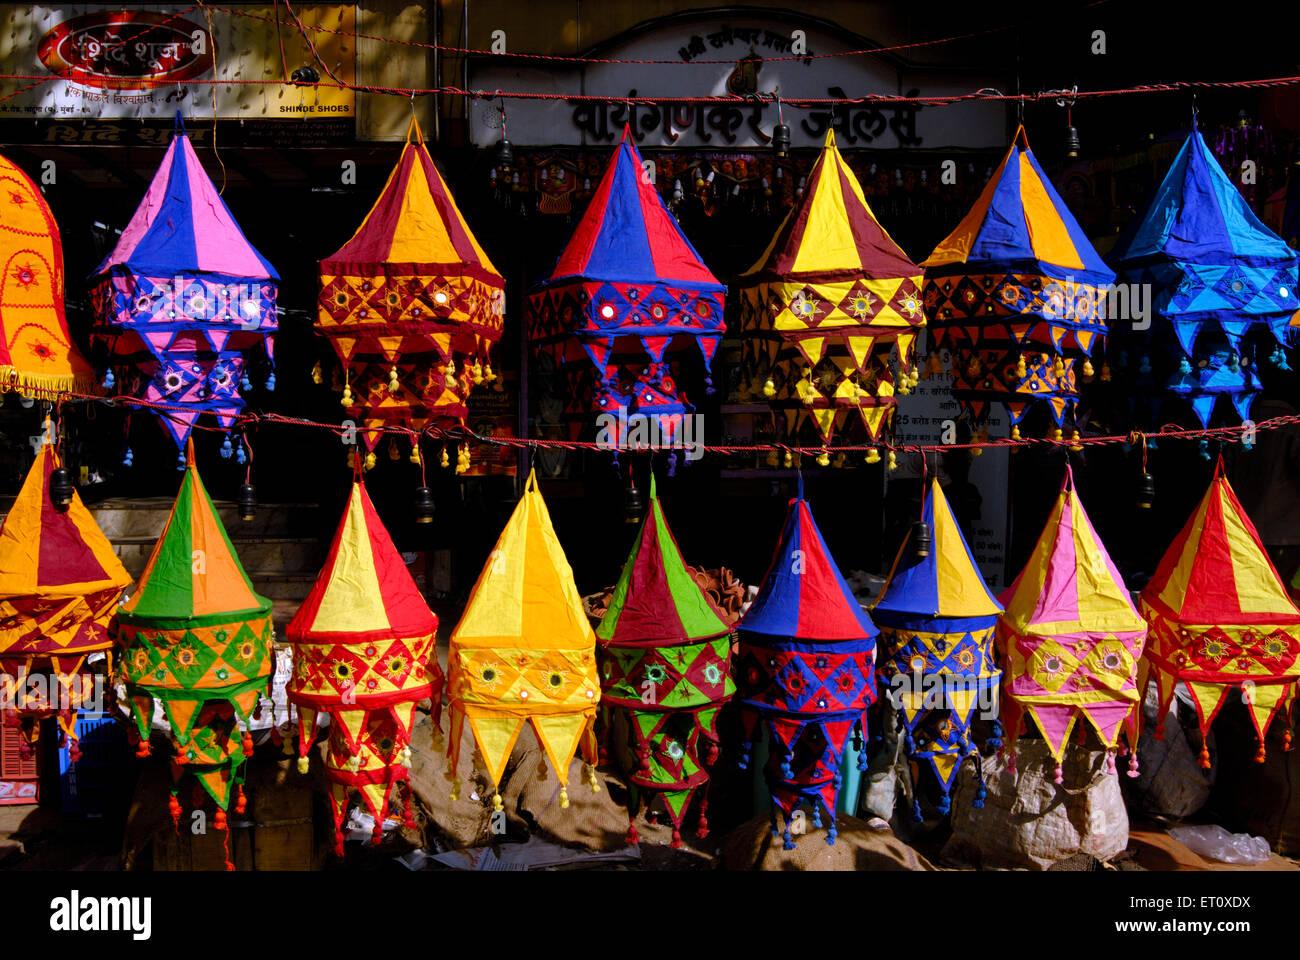 Colourful lanterns cloth lampshades handicraft work akashkandil hang colourful lanterns cloth lampshades handicraft work akashkandil hang shop for sell celebrating diwali festival dadar bombay aloadofball Images